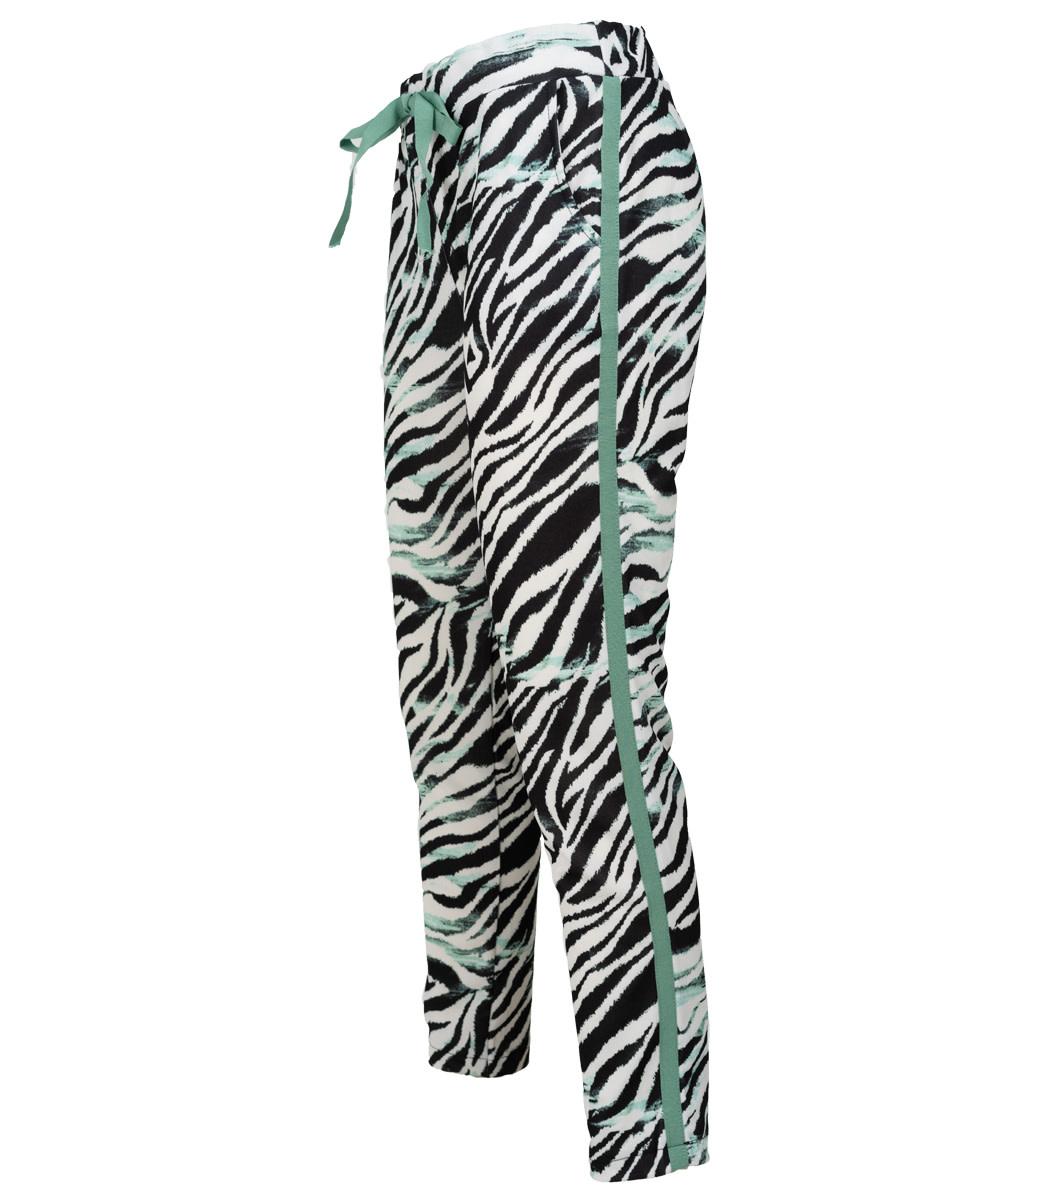 Gemma Ricceri Broek zwart/groen zebraprint Reina